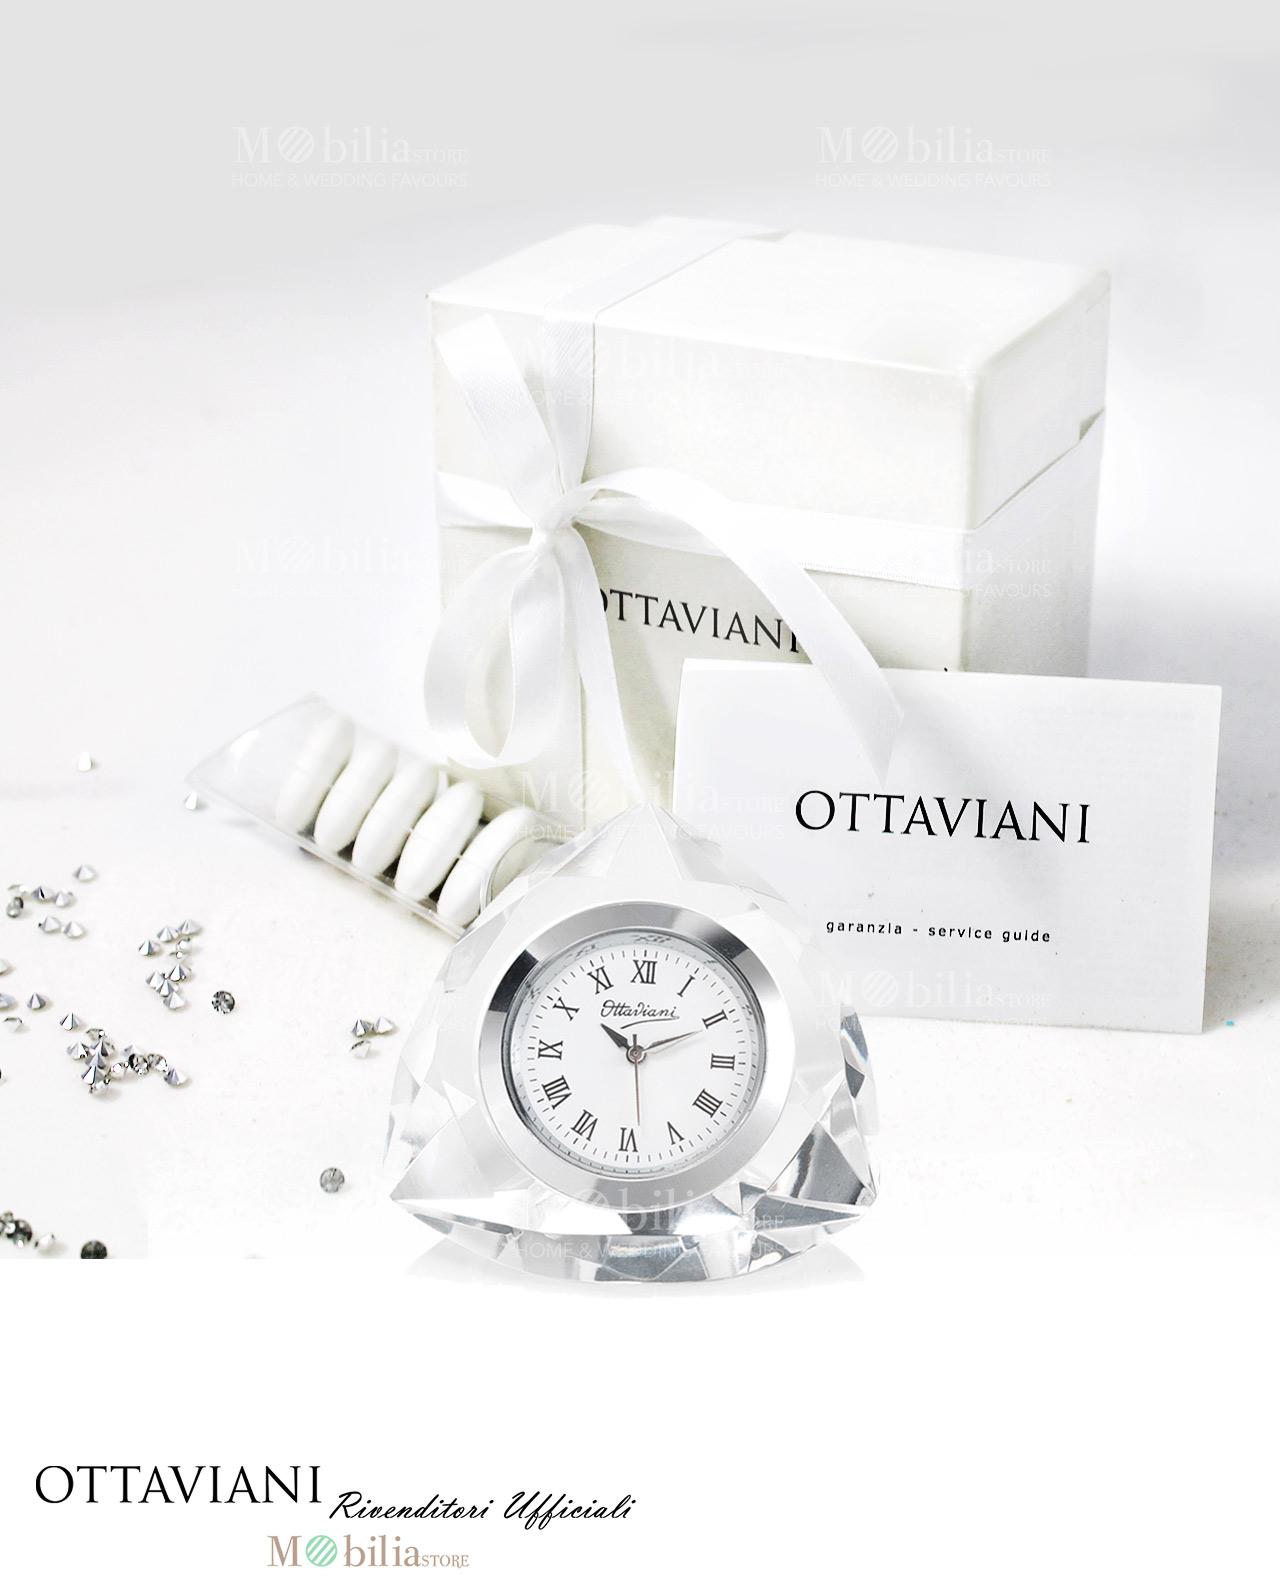 Bomboniere matrimonio orologio da tavolo triangolare ottaviani - Ottaviani orologio da tavolo ...